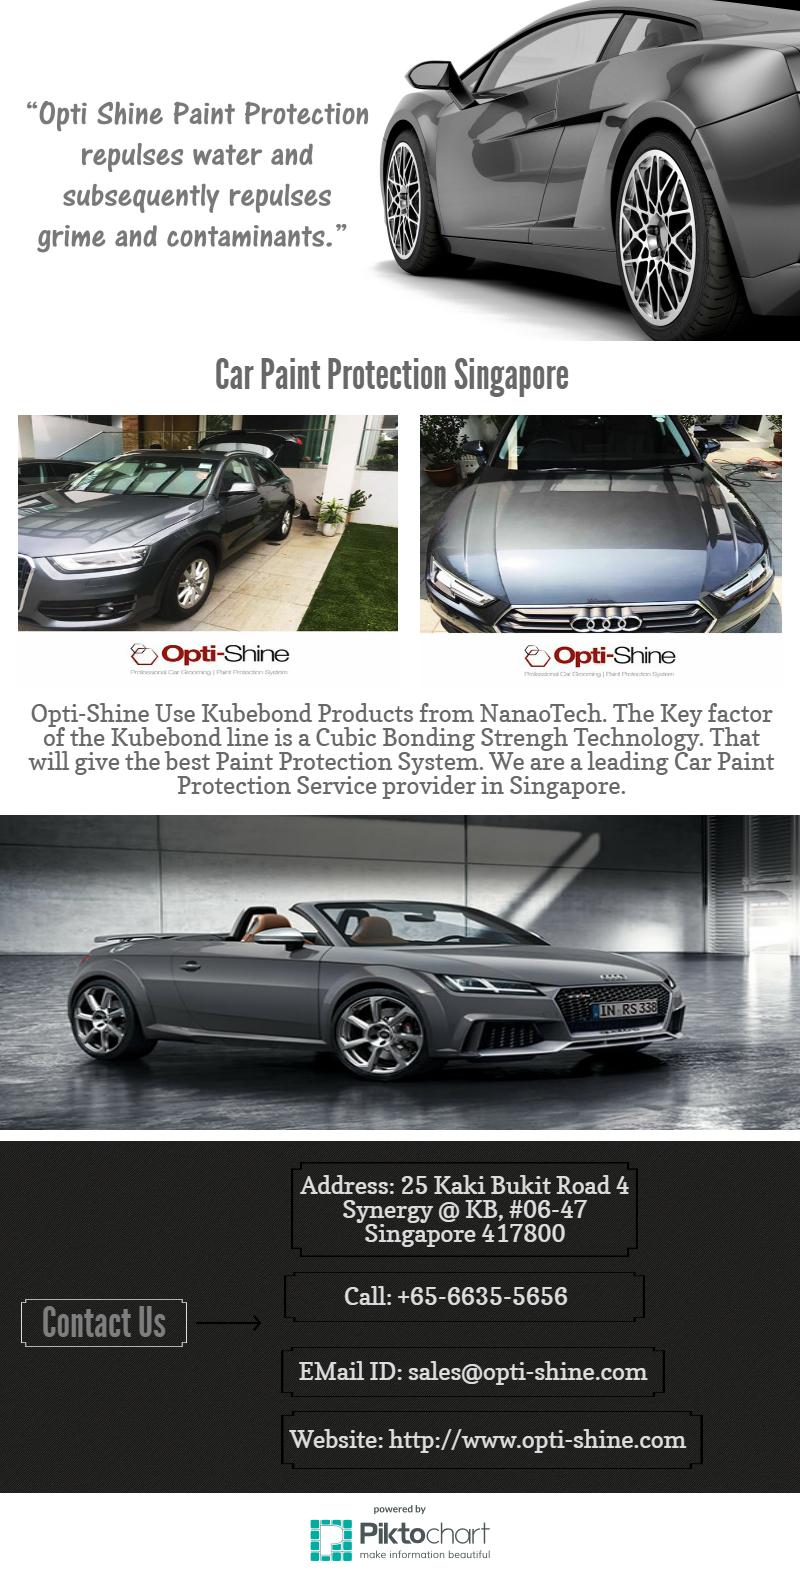 Idea by Opti shine on Car Paint Protection Singapore